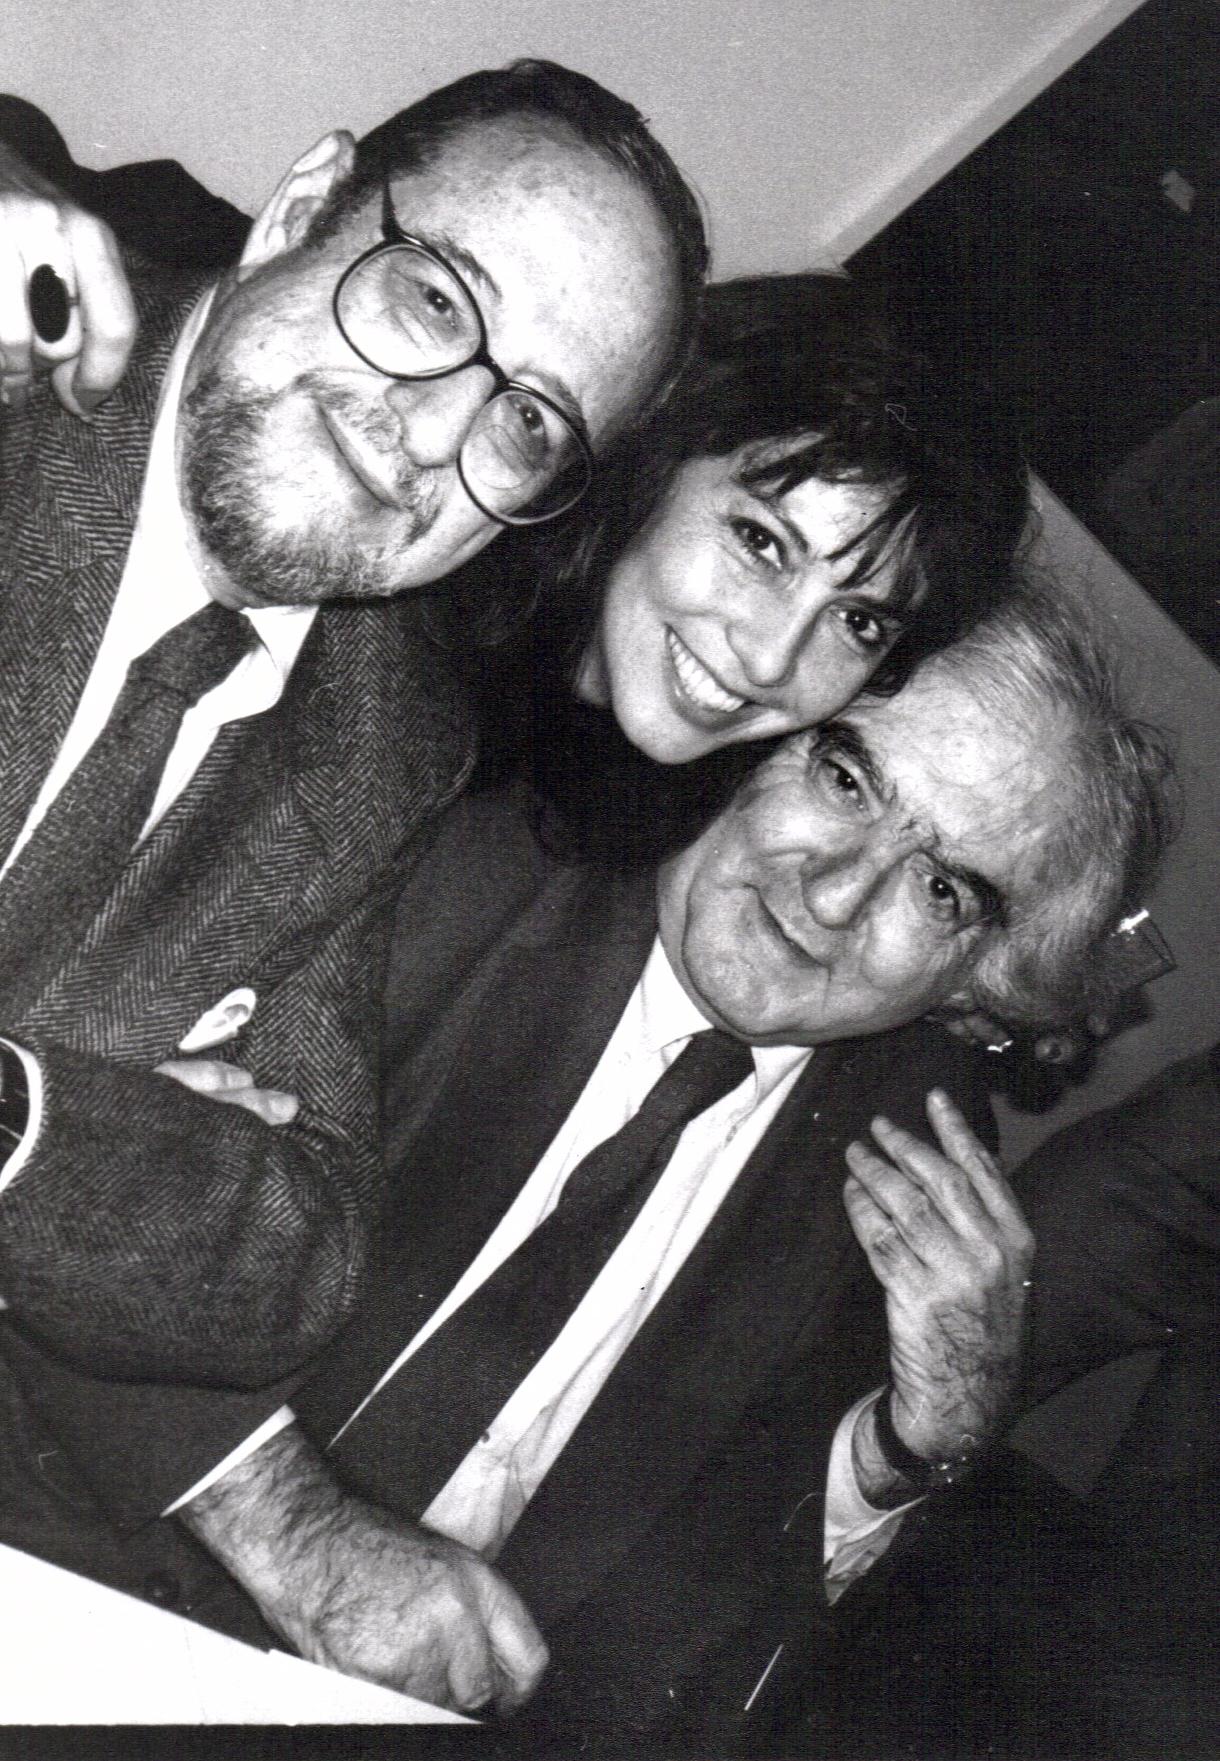 Arnold Newman Loren Ellis Cornell Capa at National Arts Club Photo Admin. club luncheon cerca 1995